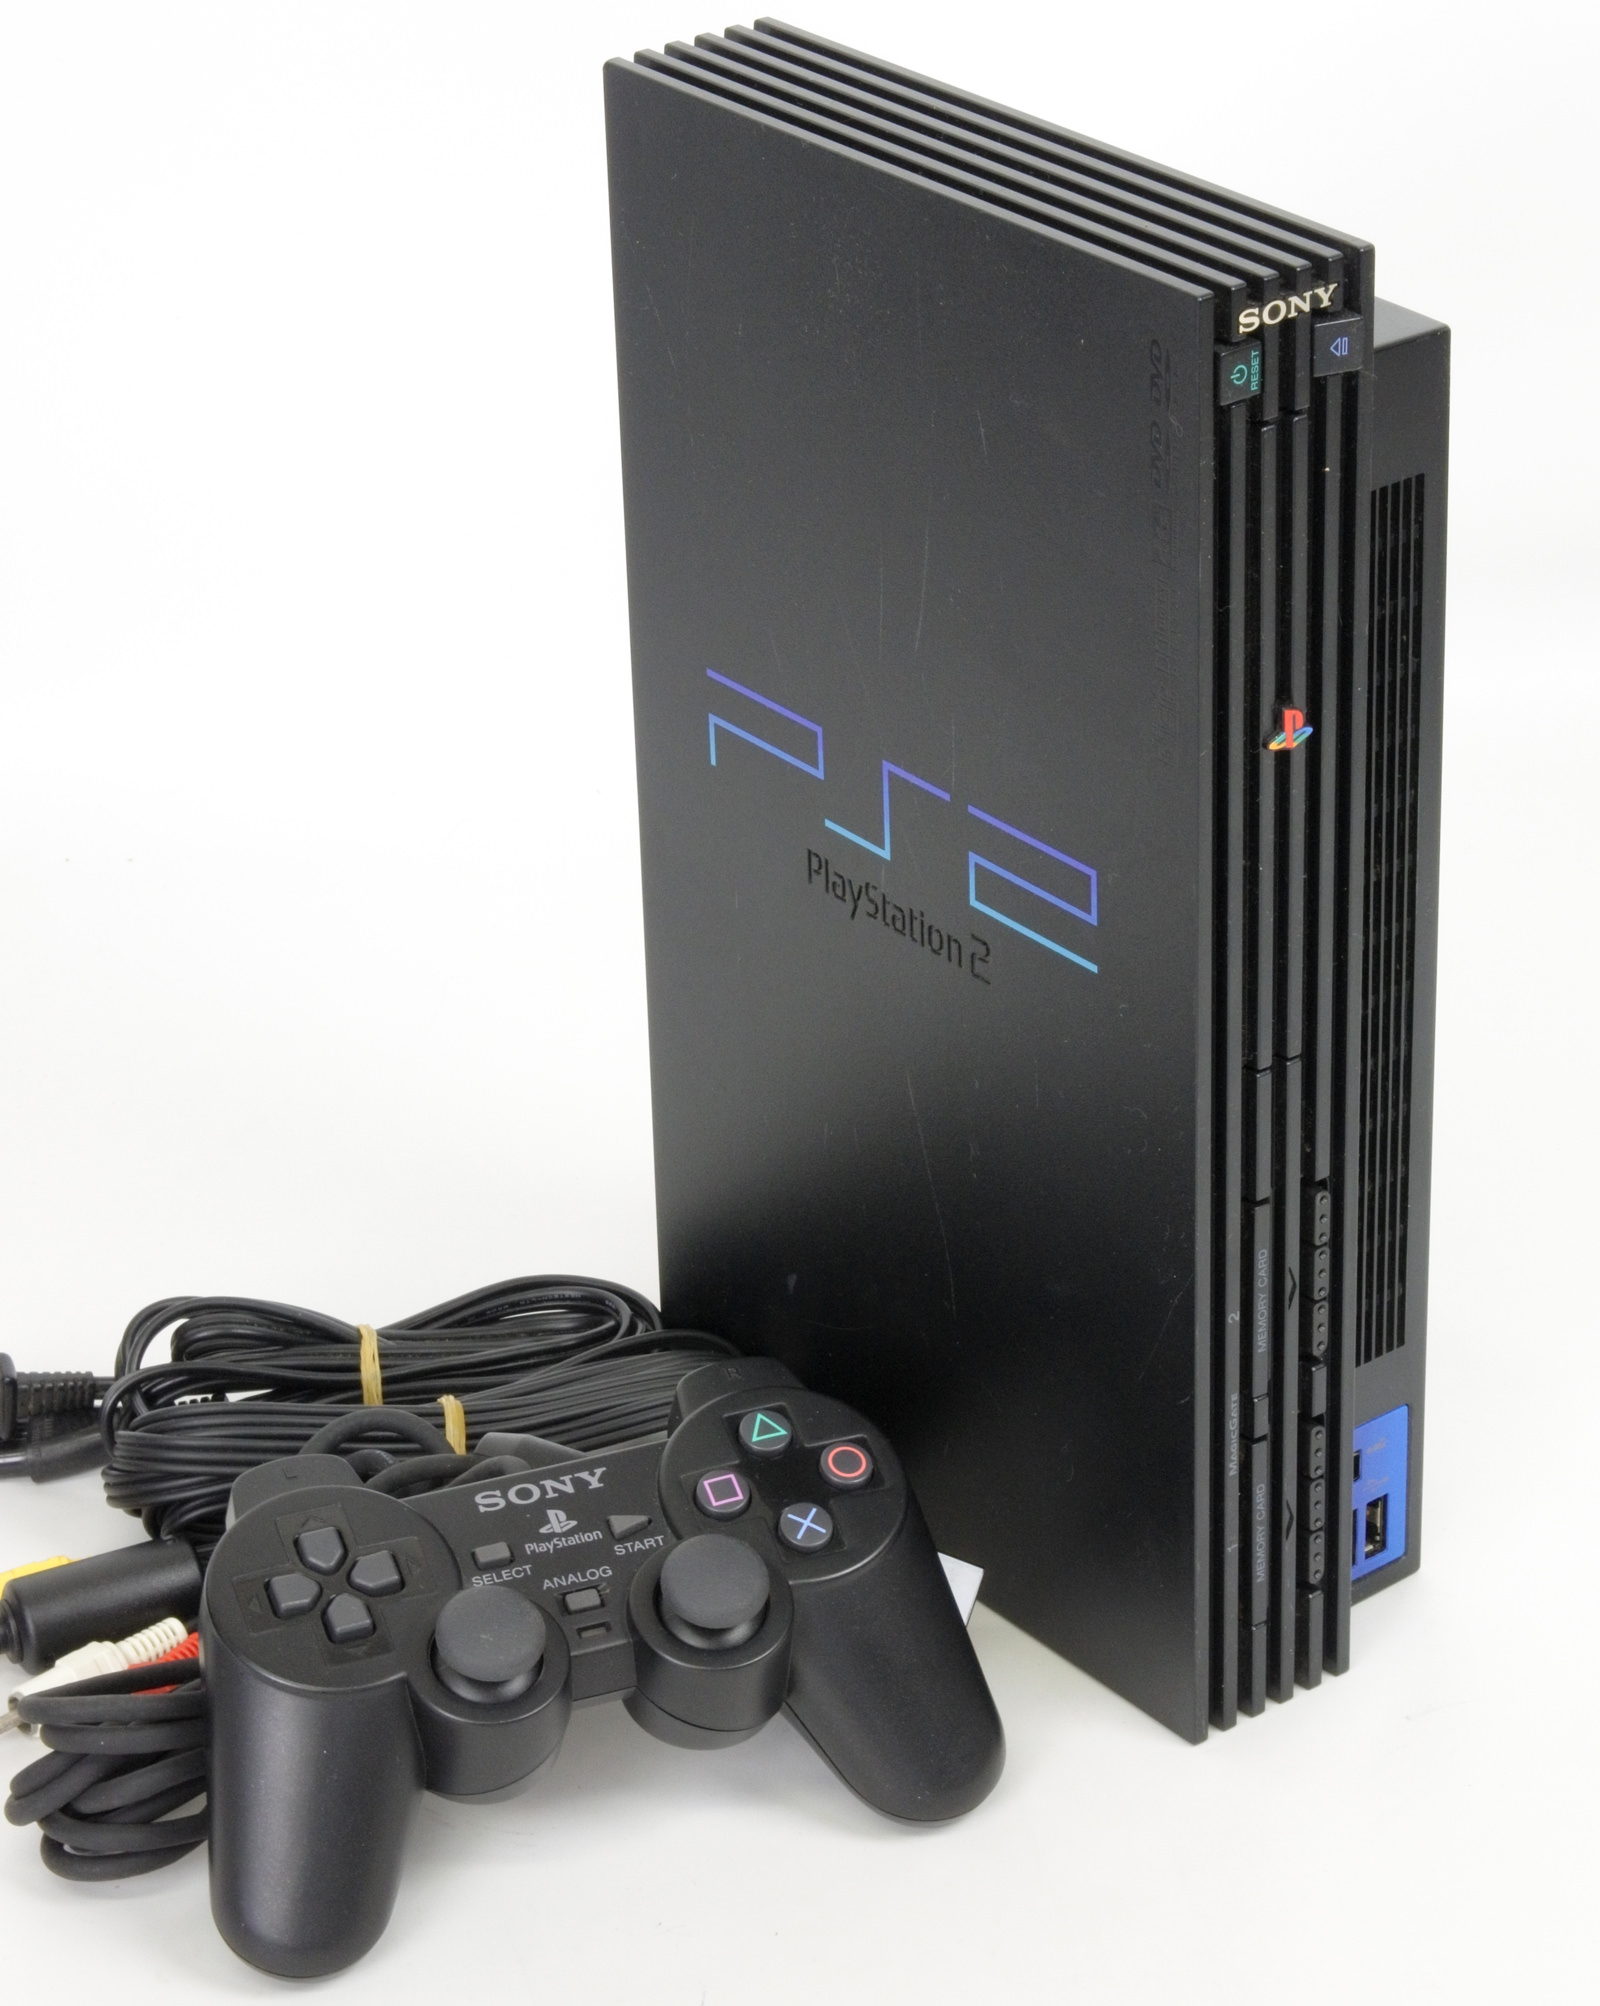 Playstation 2 Konsoli